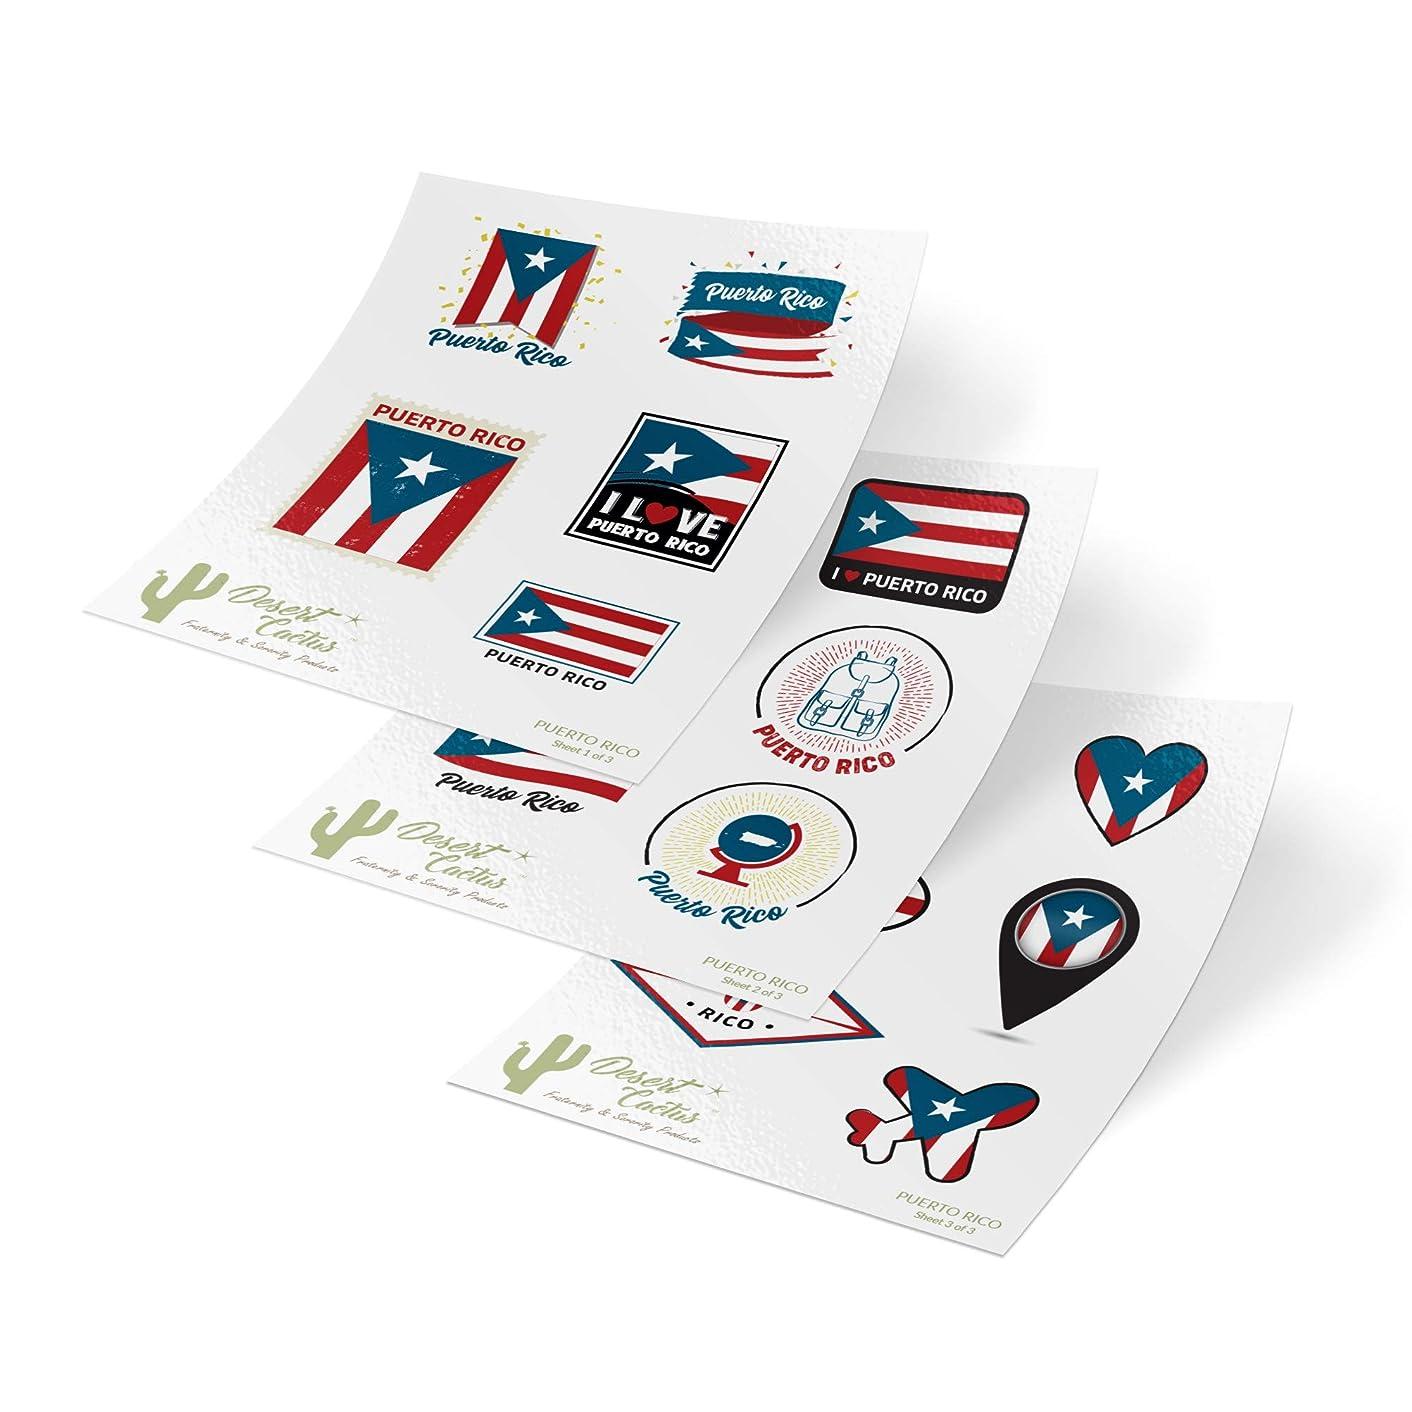 Puerto Rico State Flag Stickers Decals 3 Sheets 17 Total Pieces Kids Logo Scrapbook Car Vinyl Window Bumper Laptop 3 Sheets